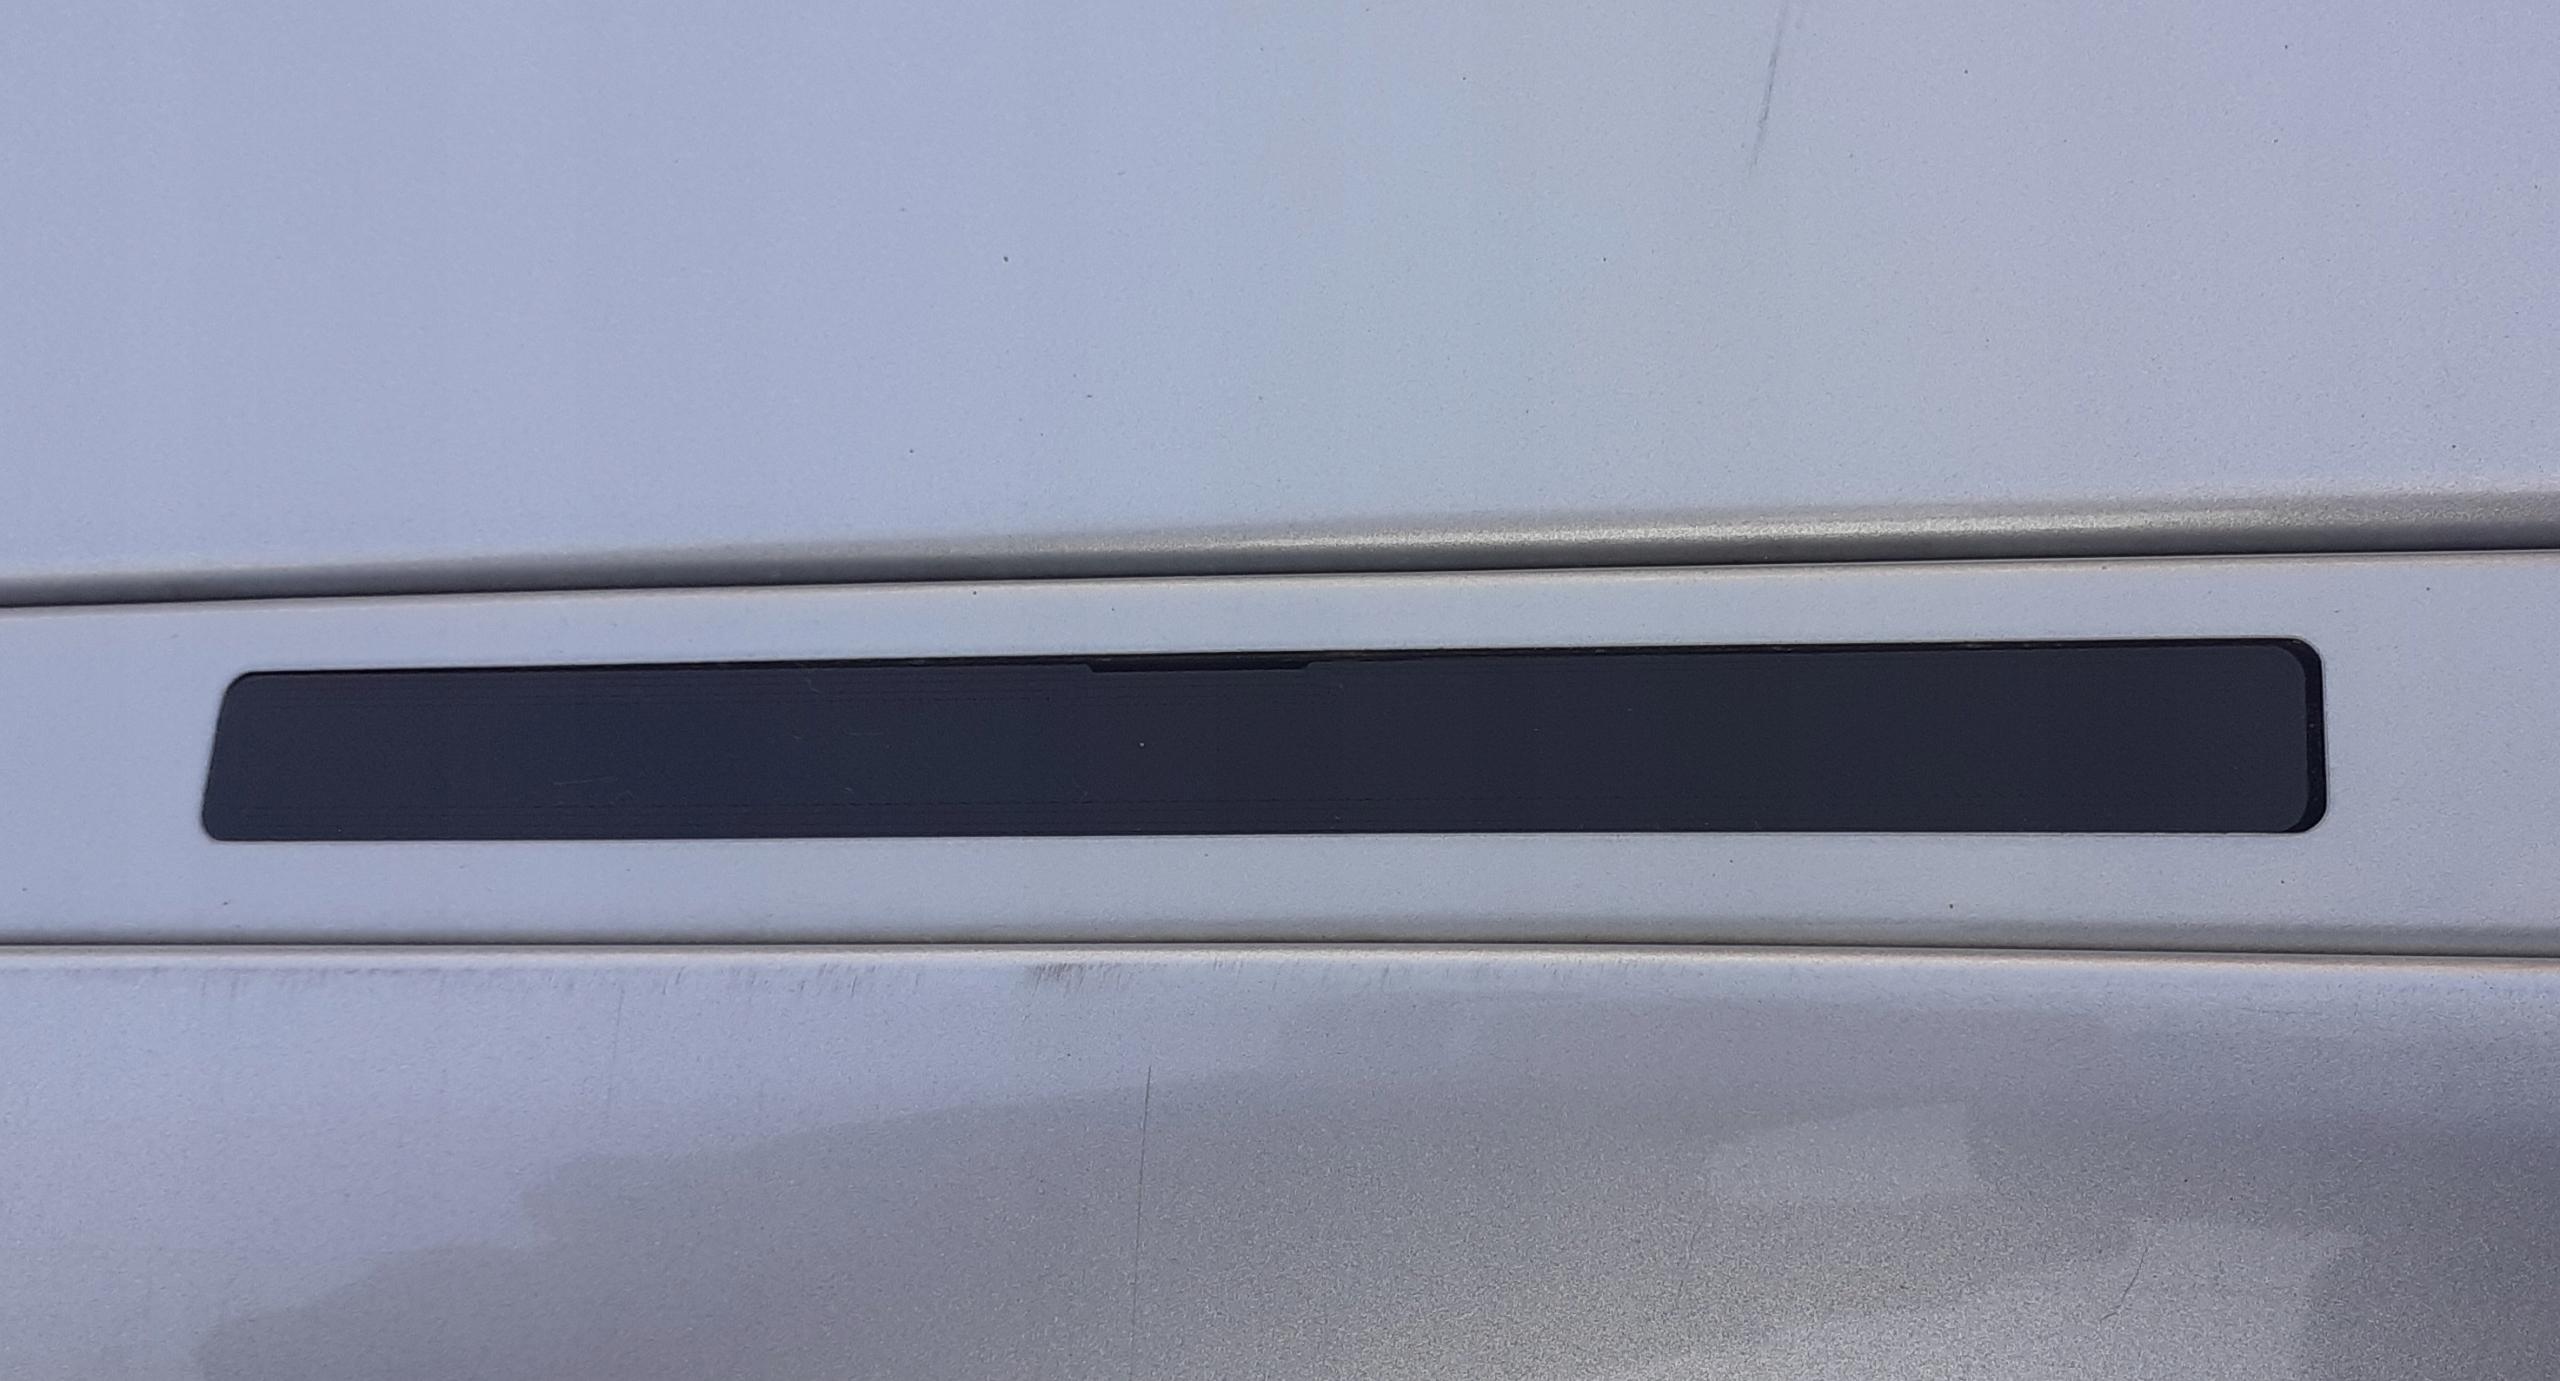 заглушка накладкі дахової opel astra h 4 штуки, фото